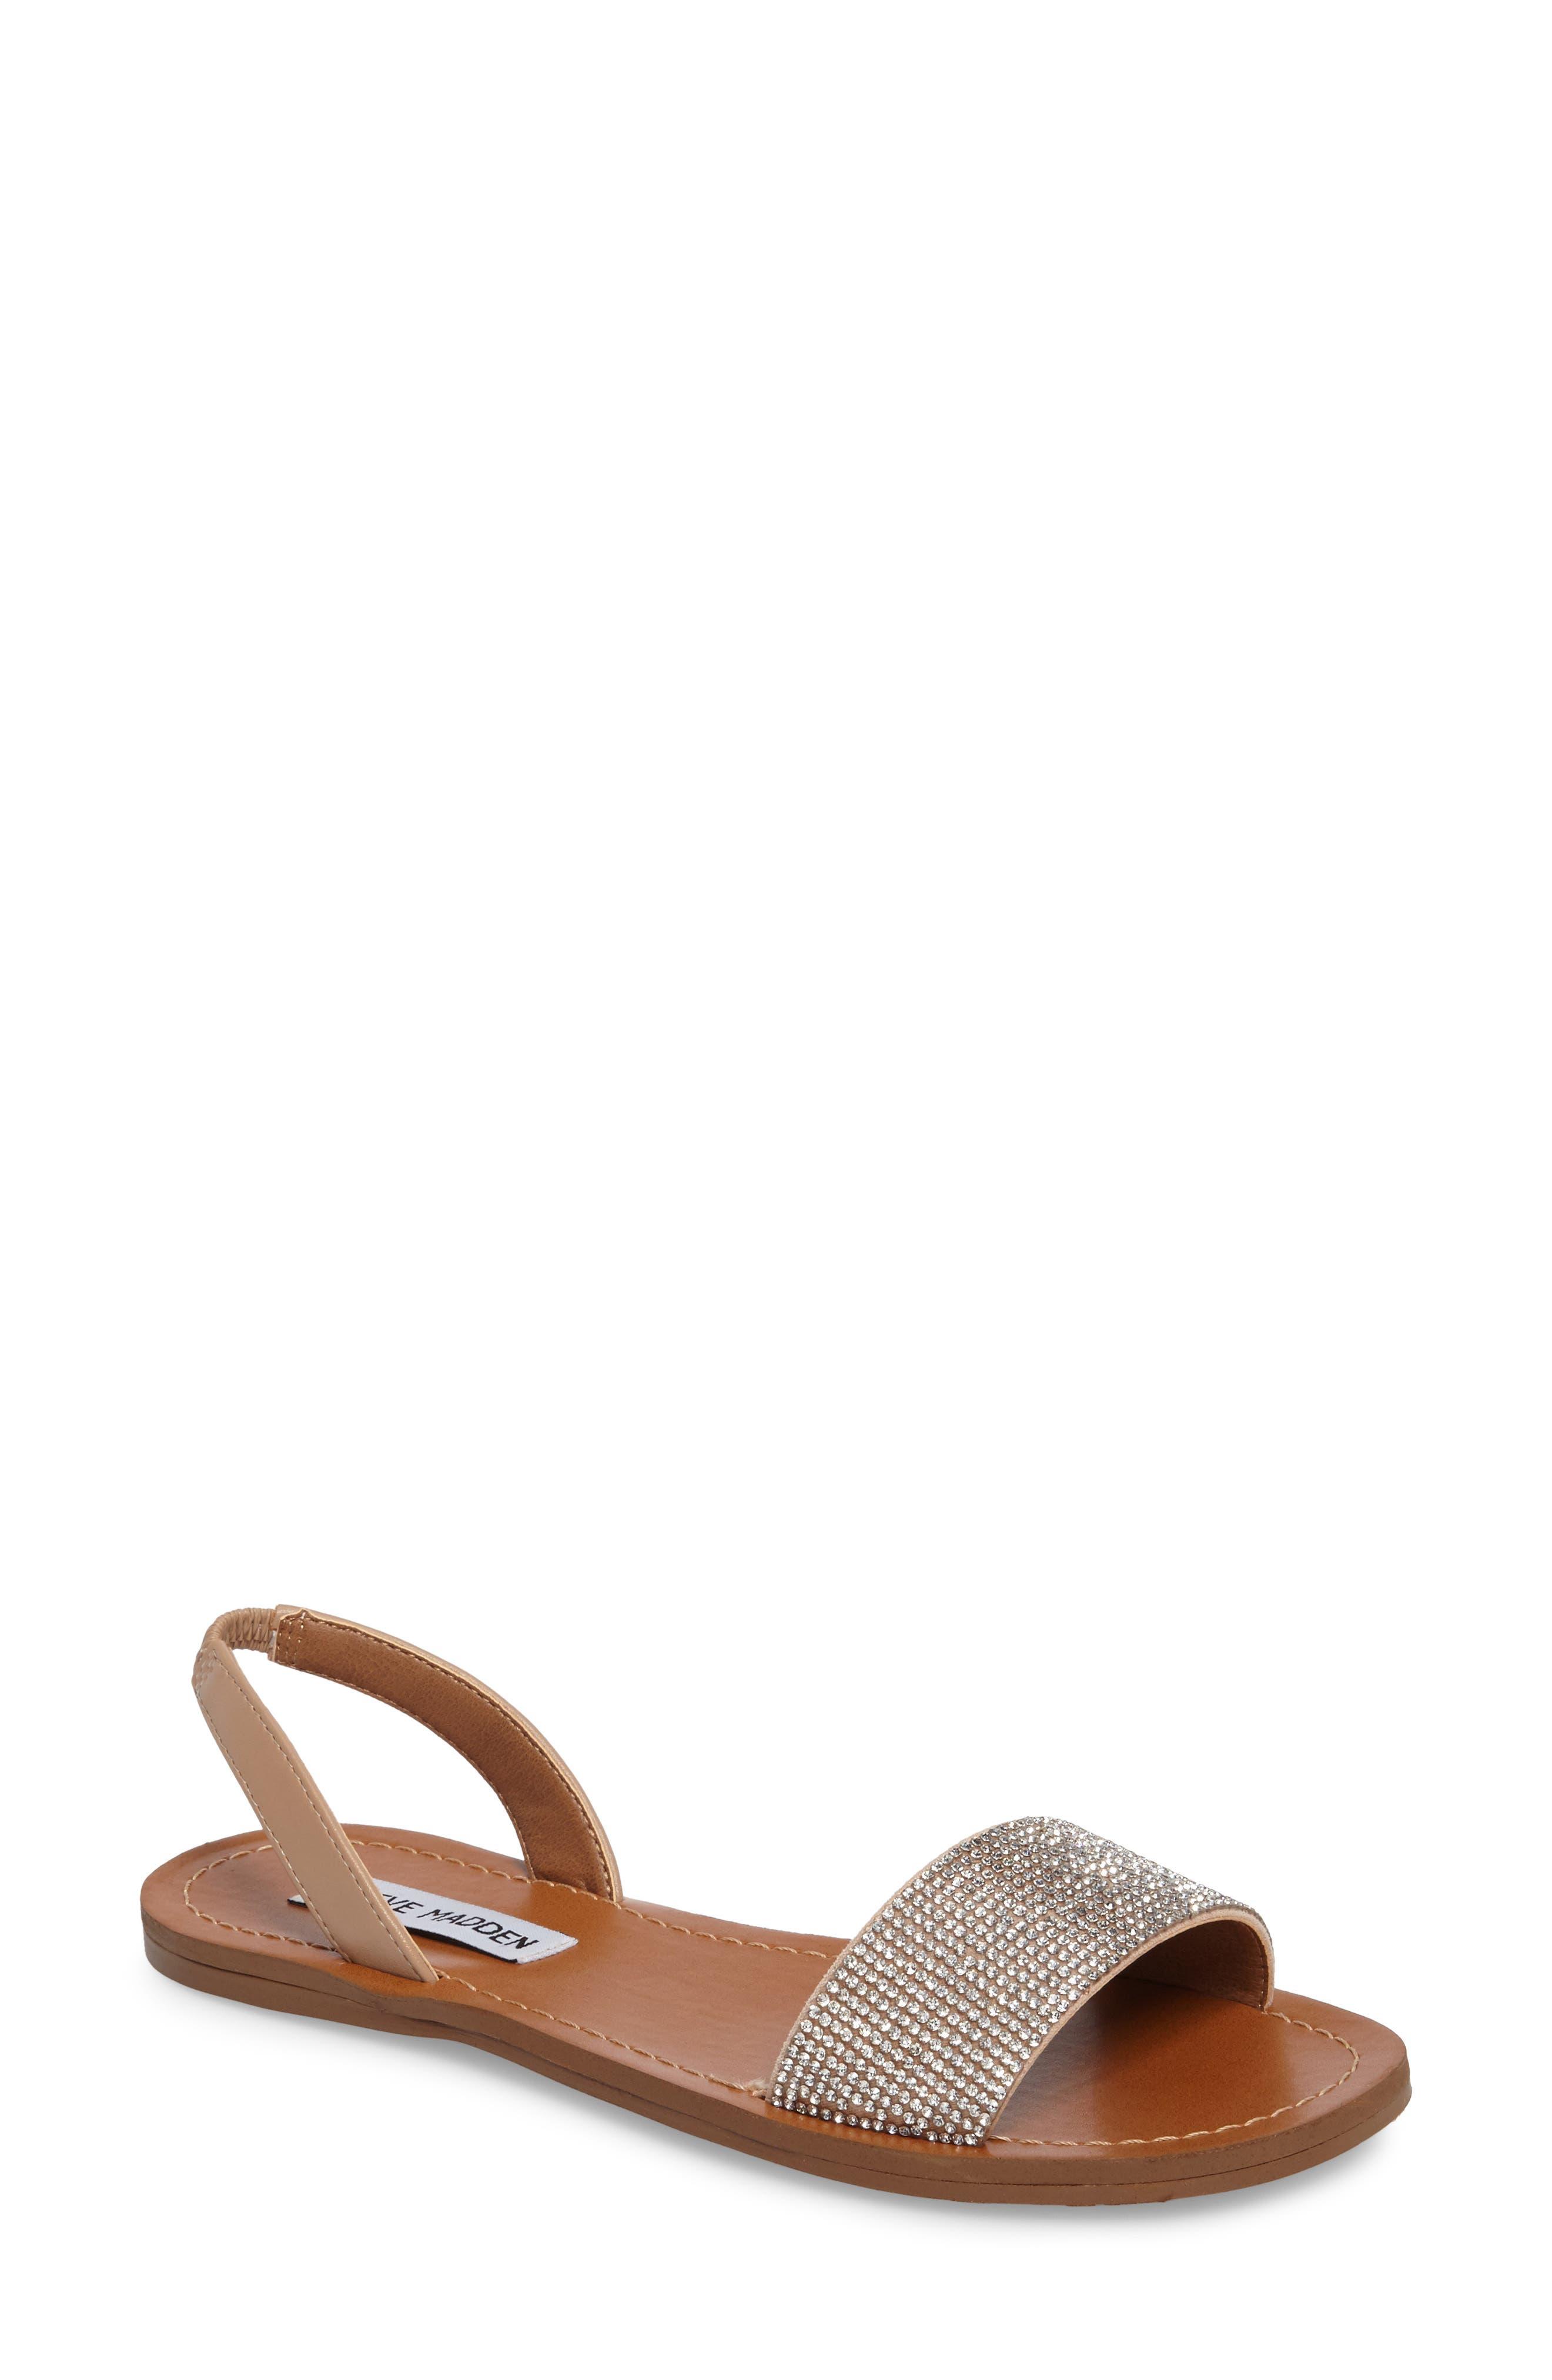 Rock Sandal,                         Main,                         color, Rhinestone Faux Leather